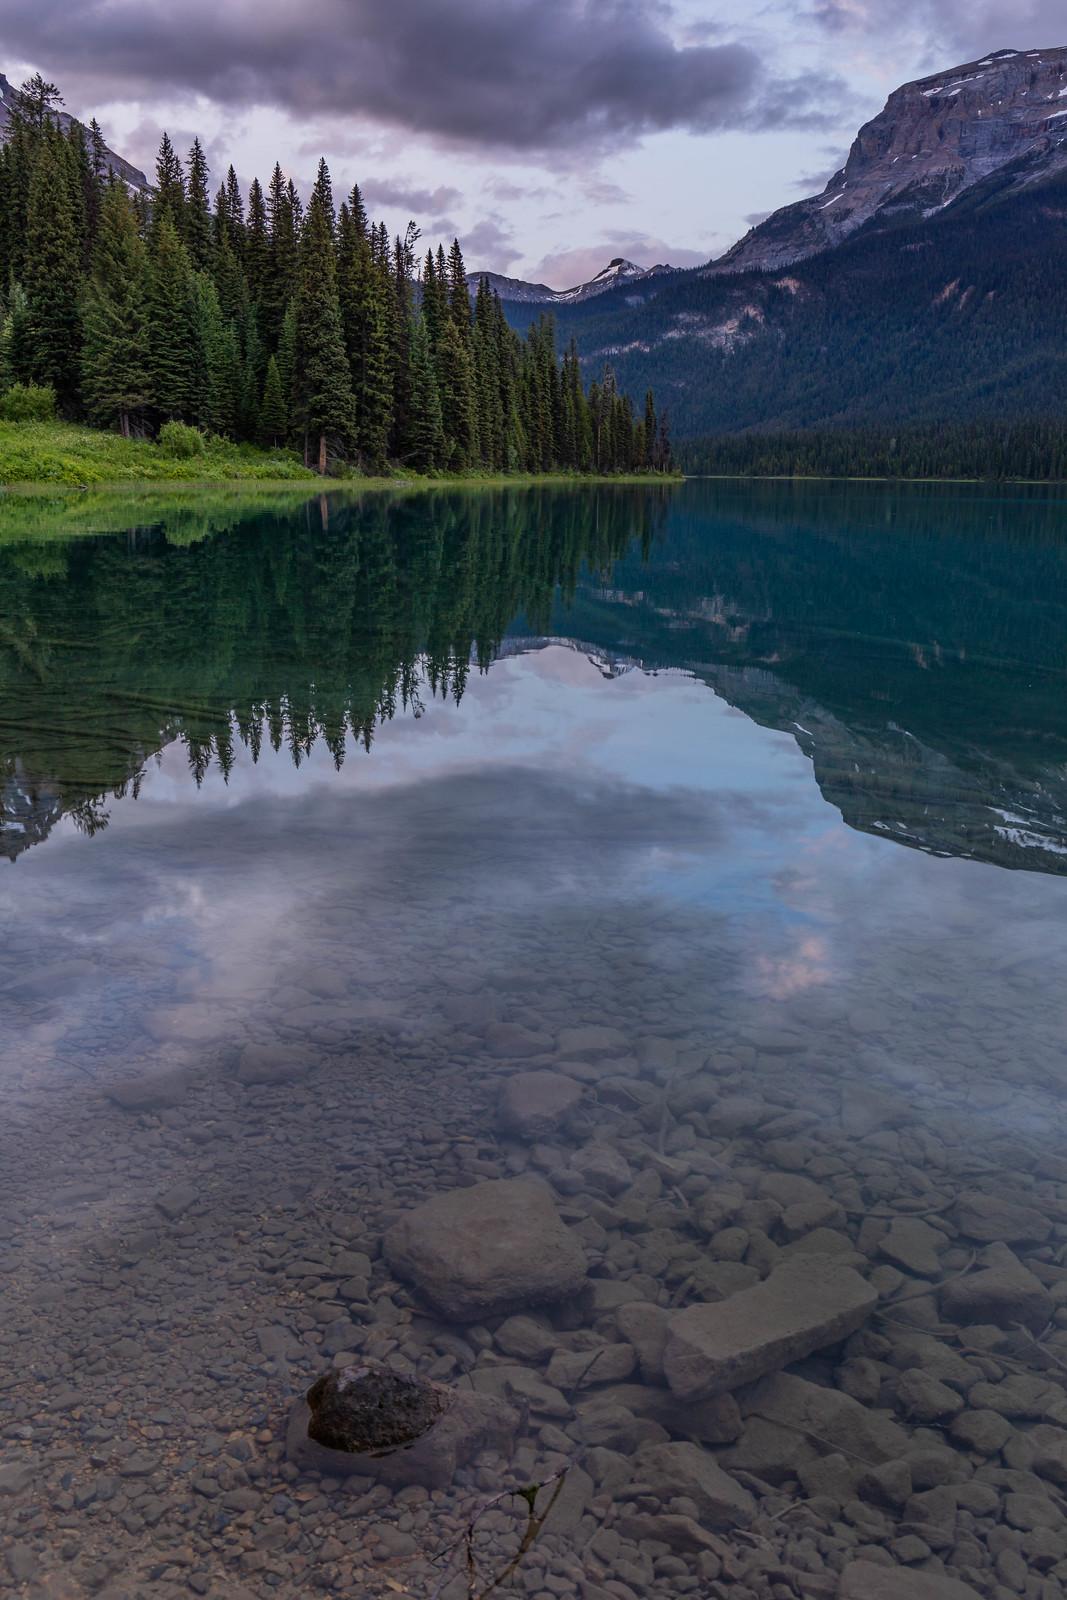 06.29. Emerald Lake, Yoho National Park, BC, Canada